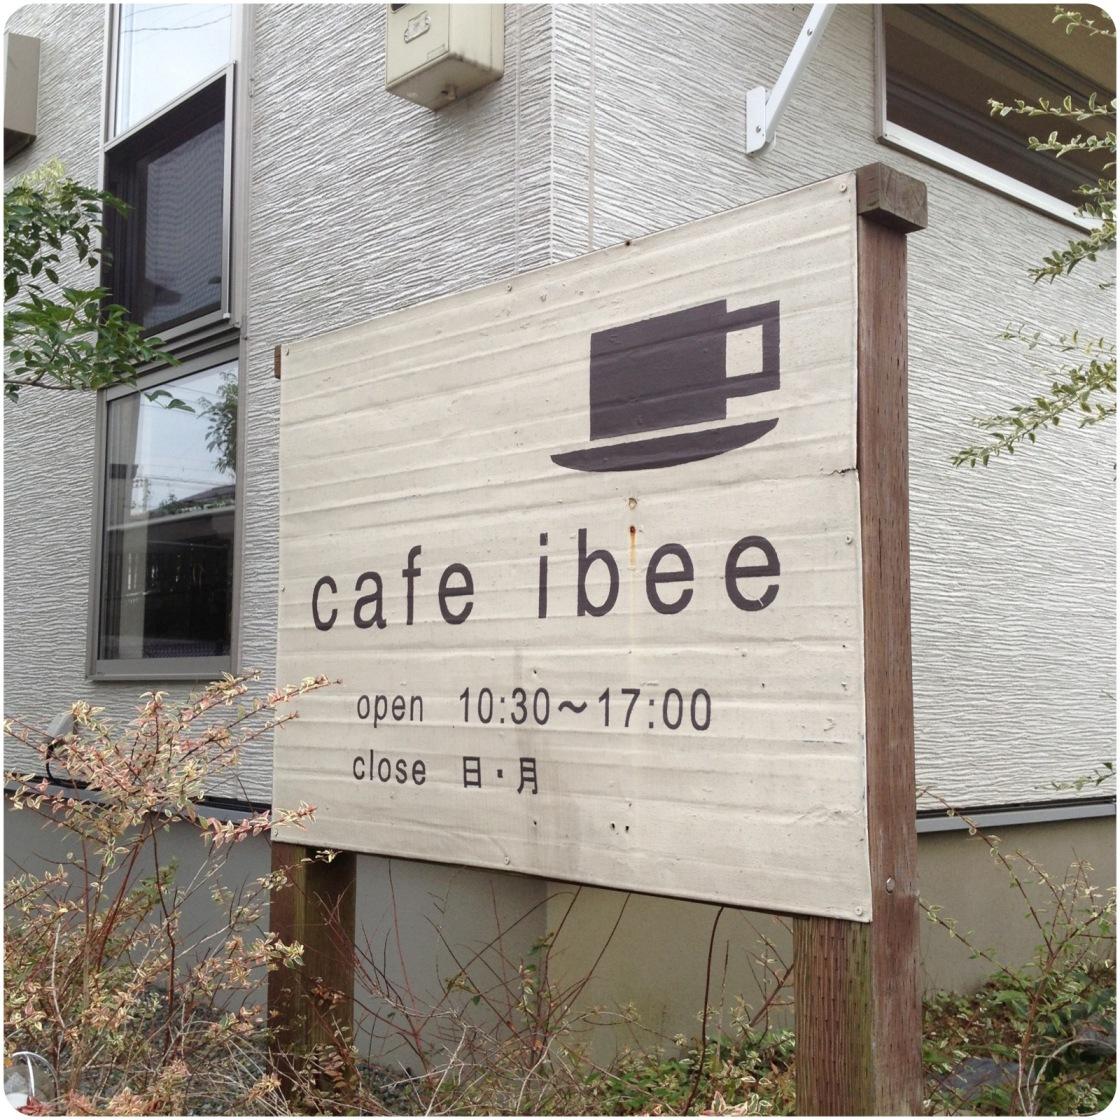 cafeibee20121027_10.jpg